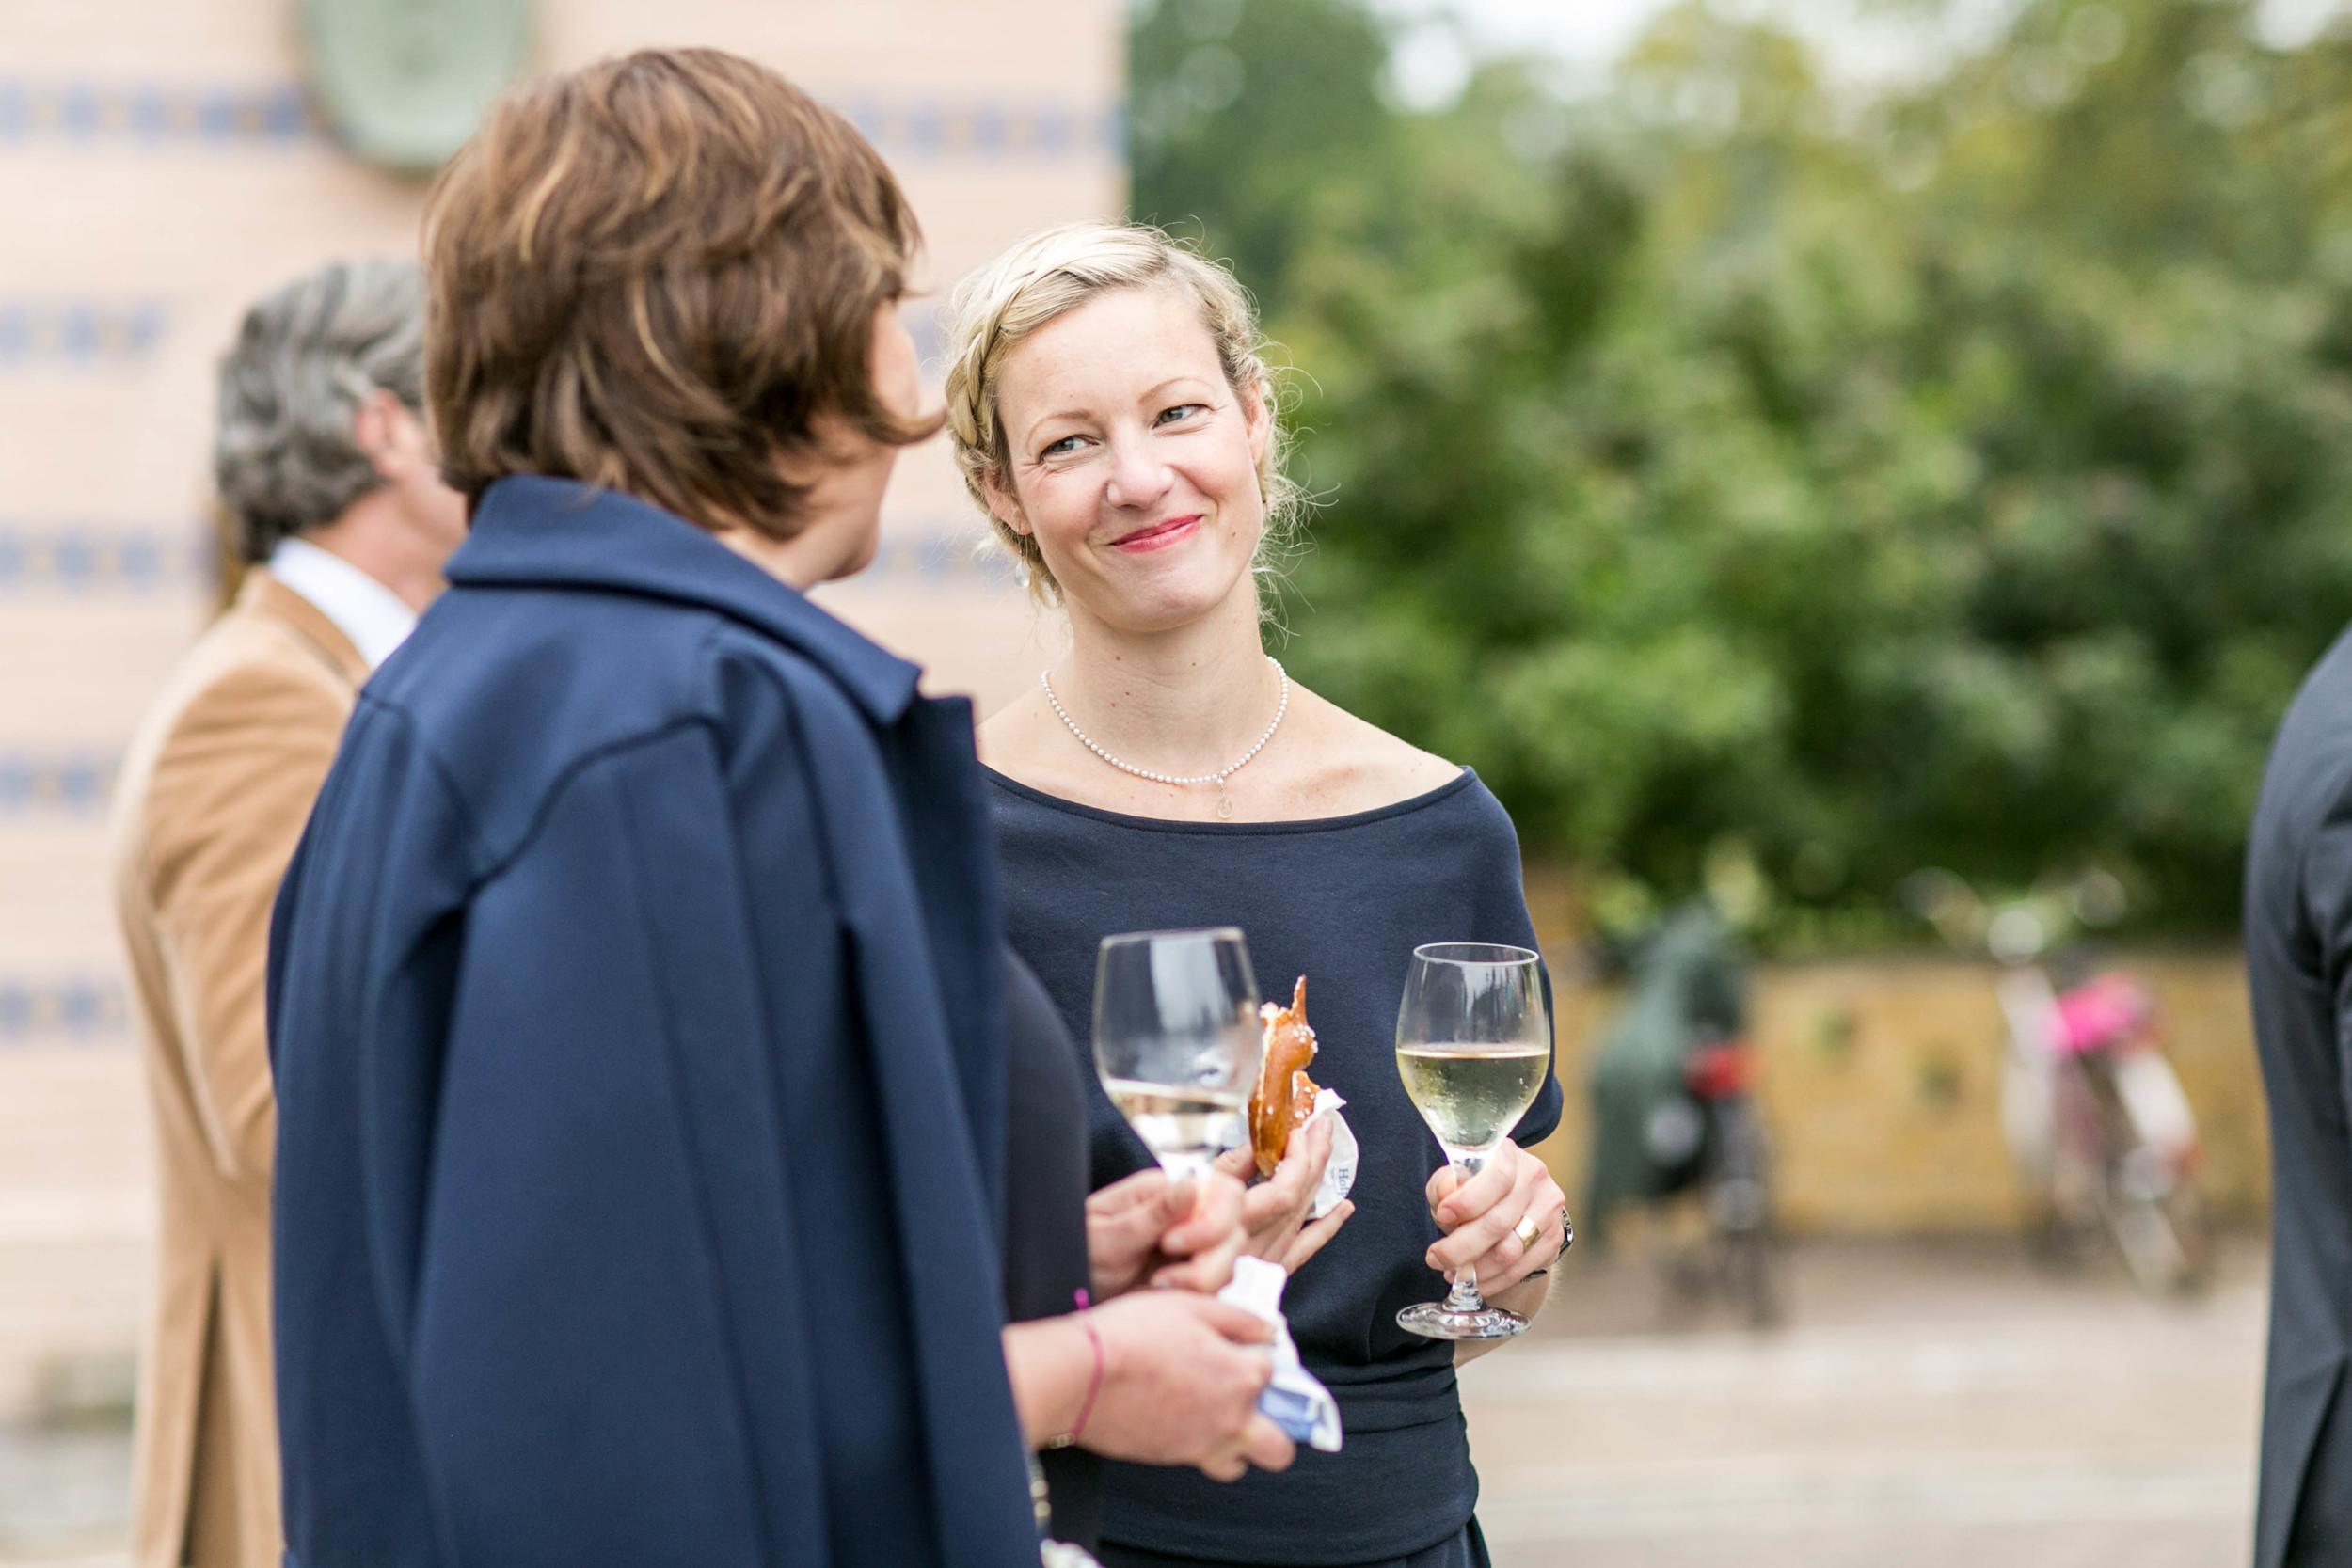 Michelberger Hotel Berlin Hochzeitsfotografie_Fran Burrows Fotografie-47.jpg